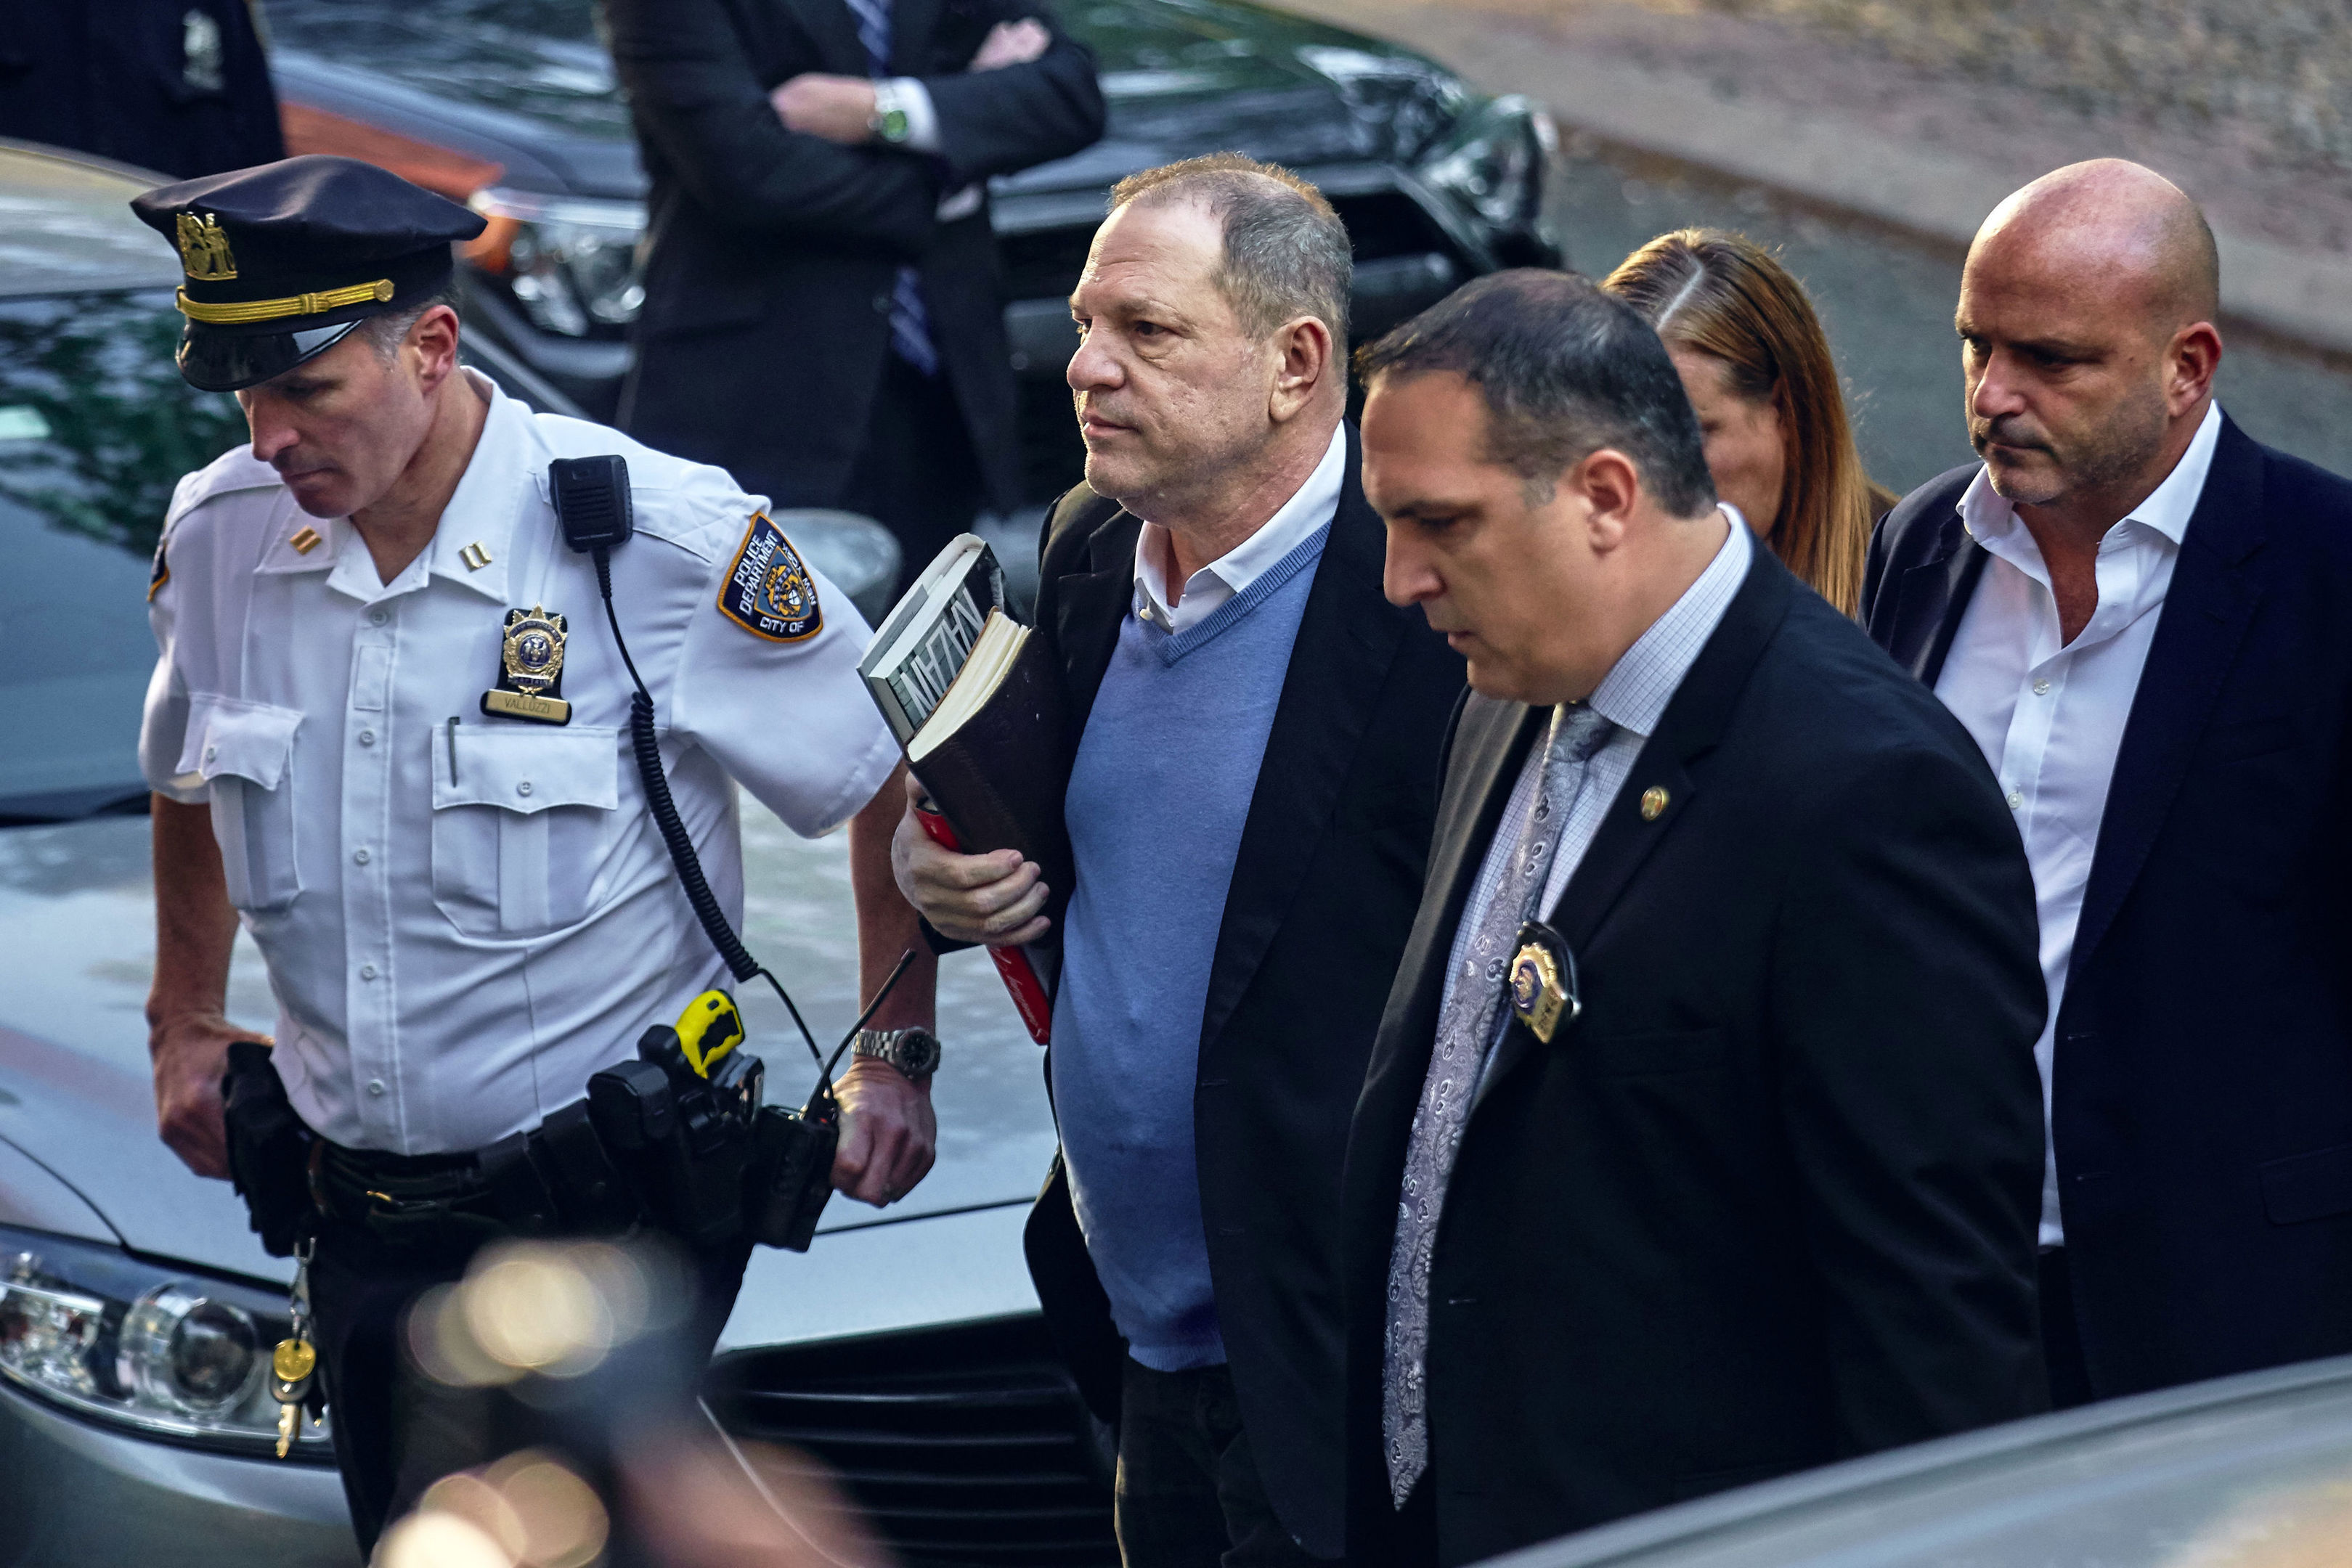 Harvey Weinstein arrives at a New York police precinct (AP Photo/Andres Kudacki)